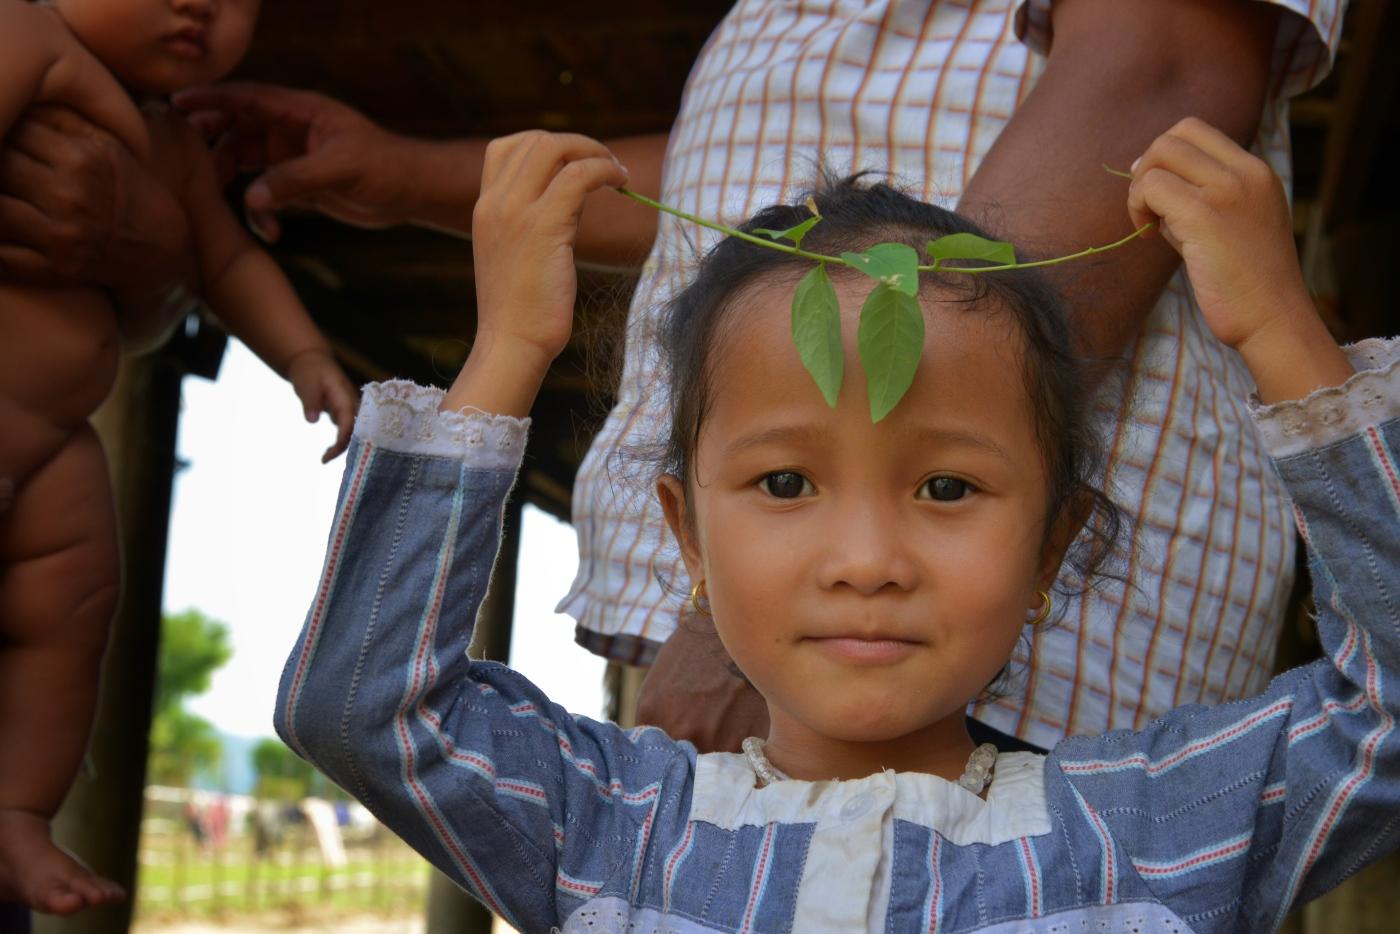 cambodian children photography by sandy hibbard lensqueen.com